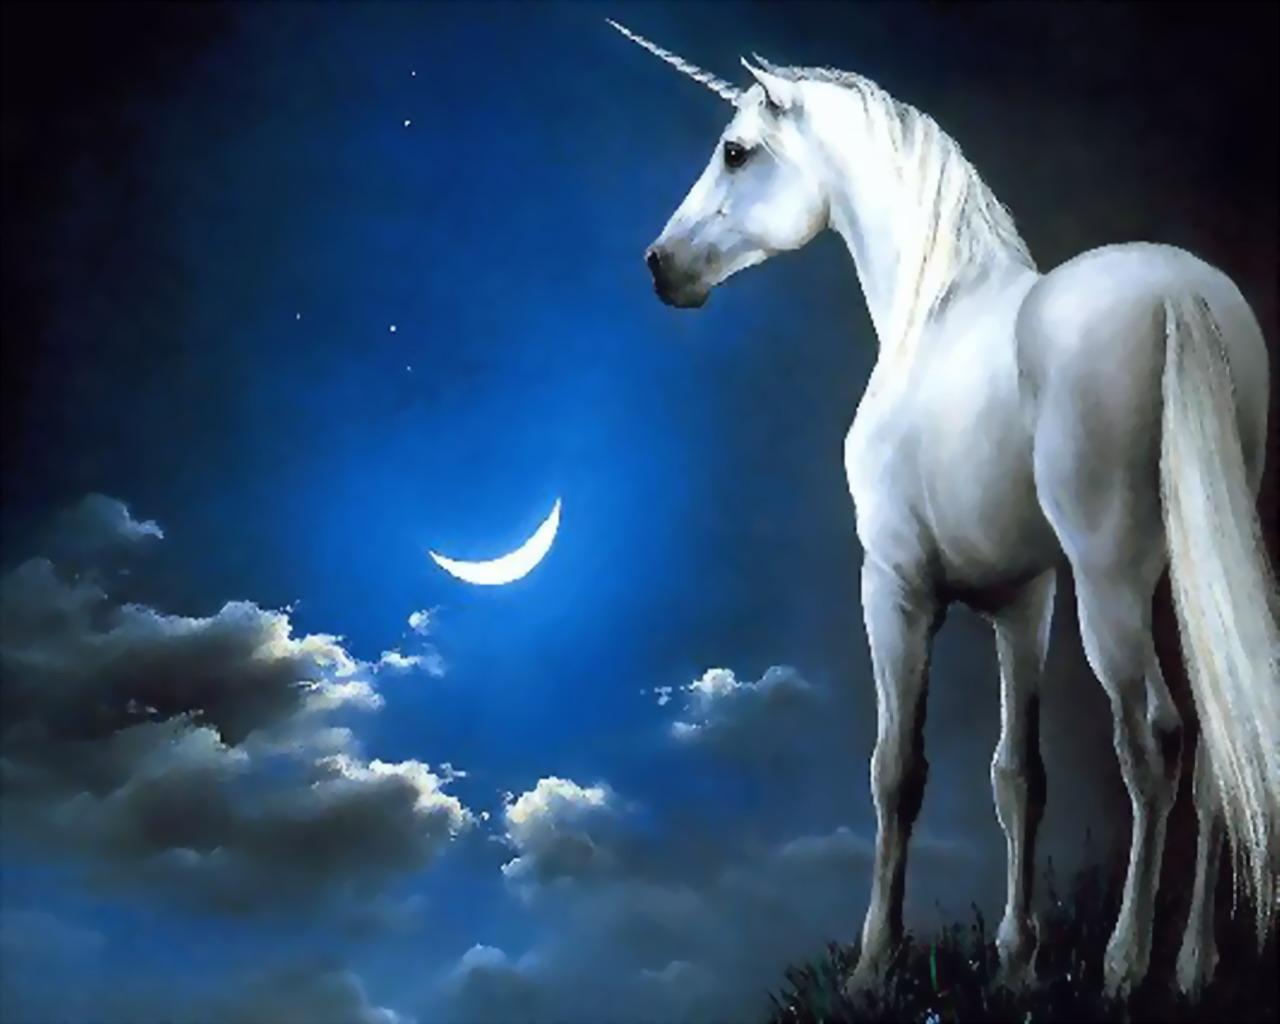 http://2.bp.blogspot.com/-mQIF4Cn9Rmo/Tbq6wBctTfI/AAAAAAAATqg/HRHJkBS5E1k/s1600/unicornios%2B%252814%2529.jpg